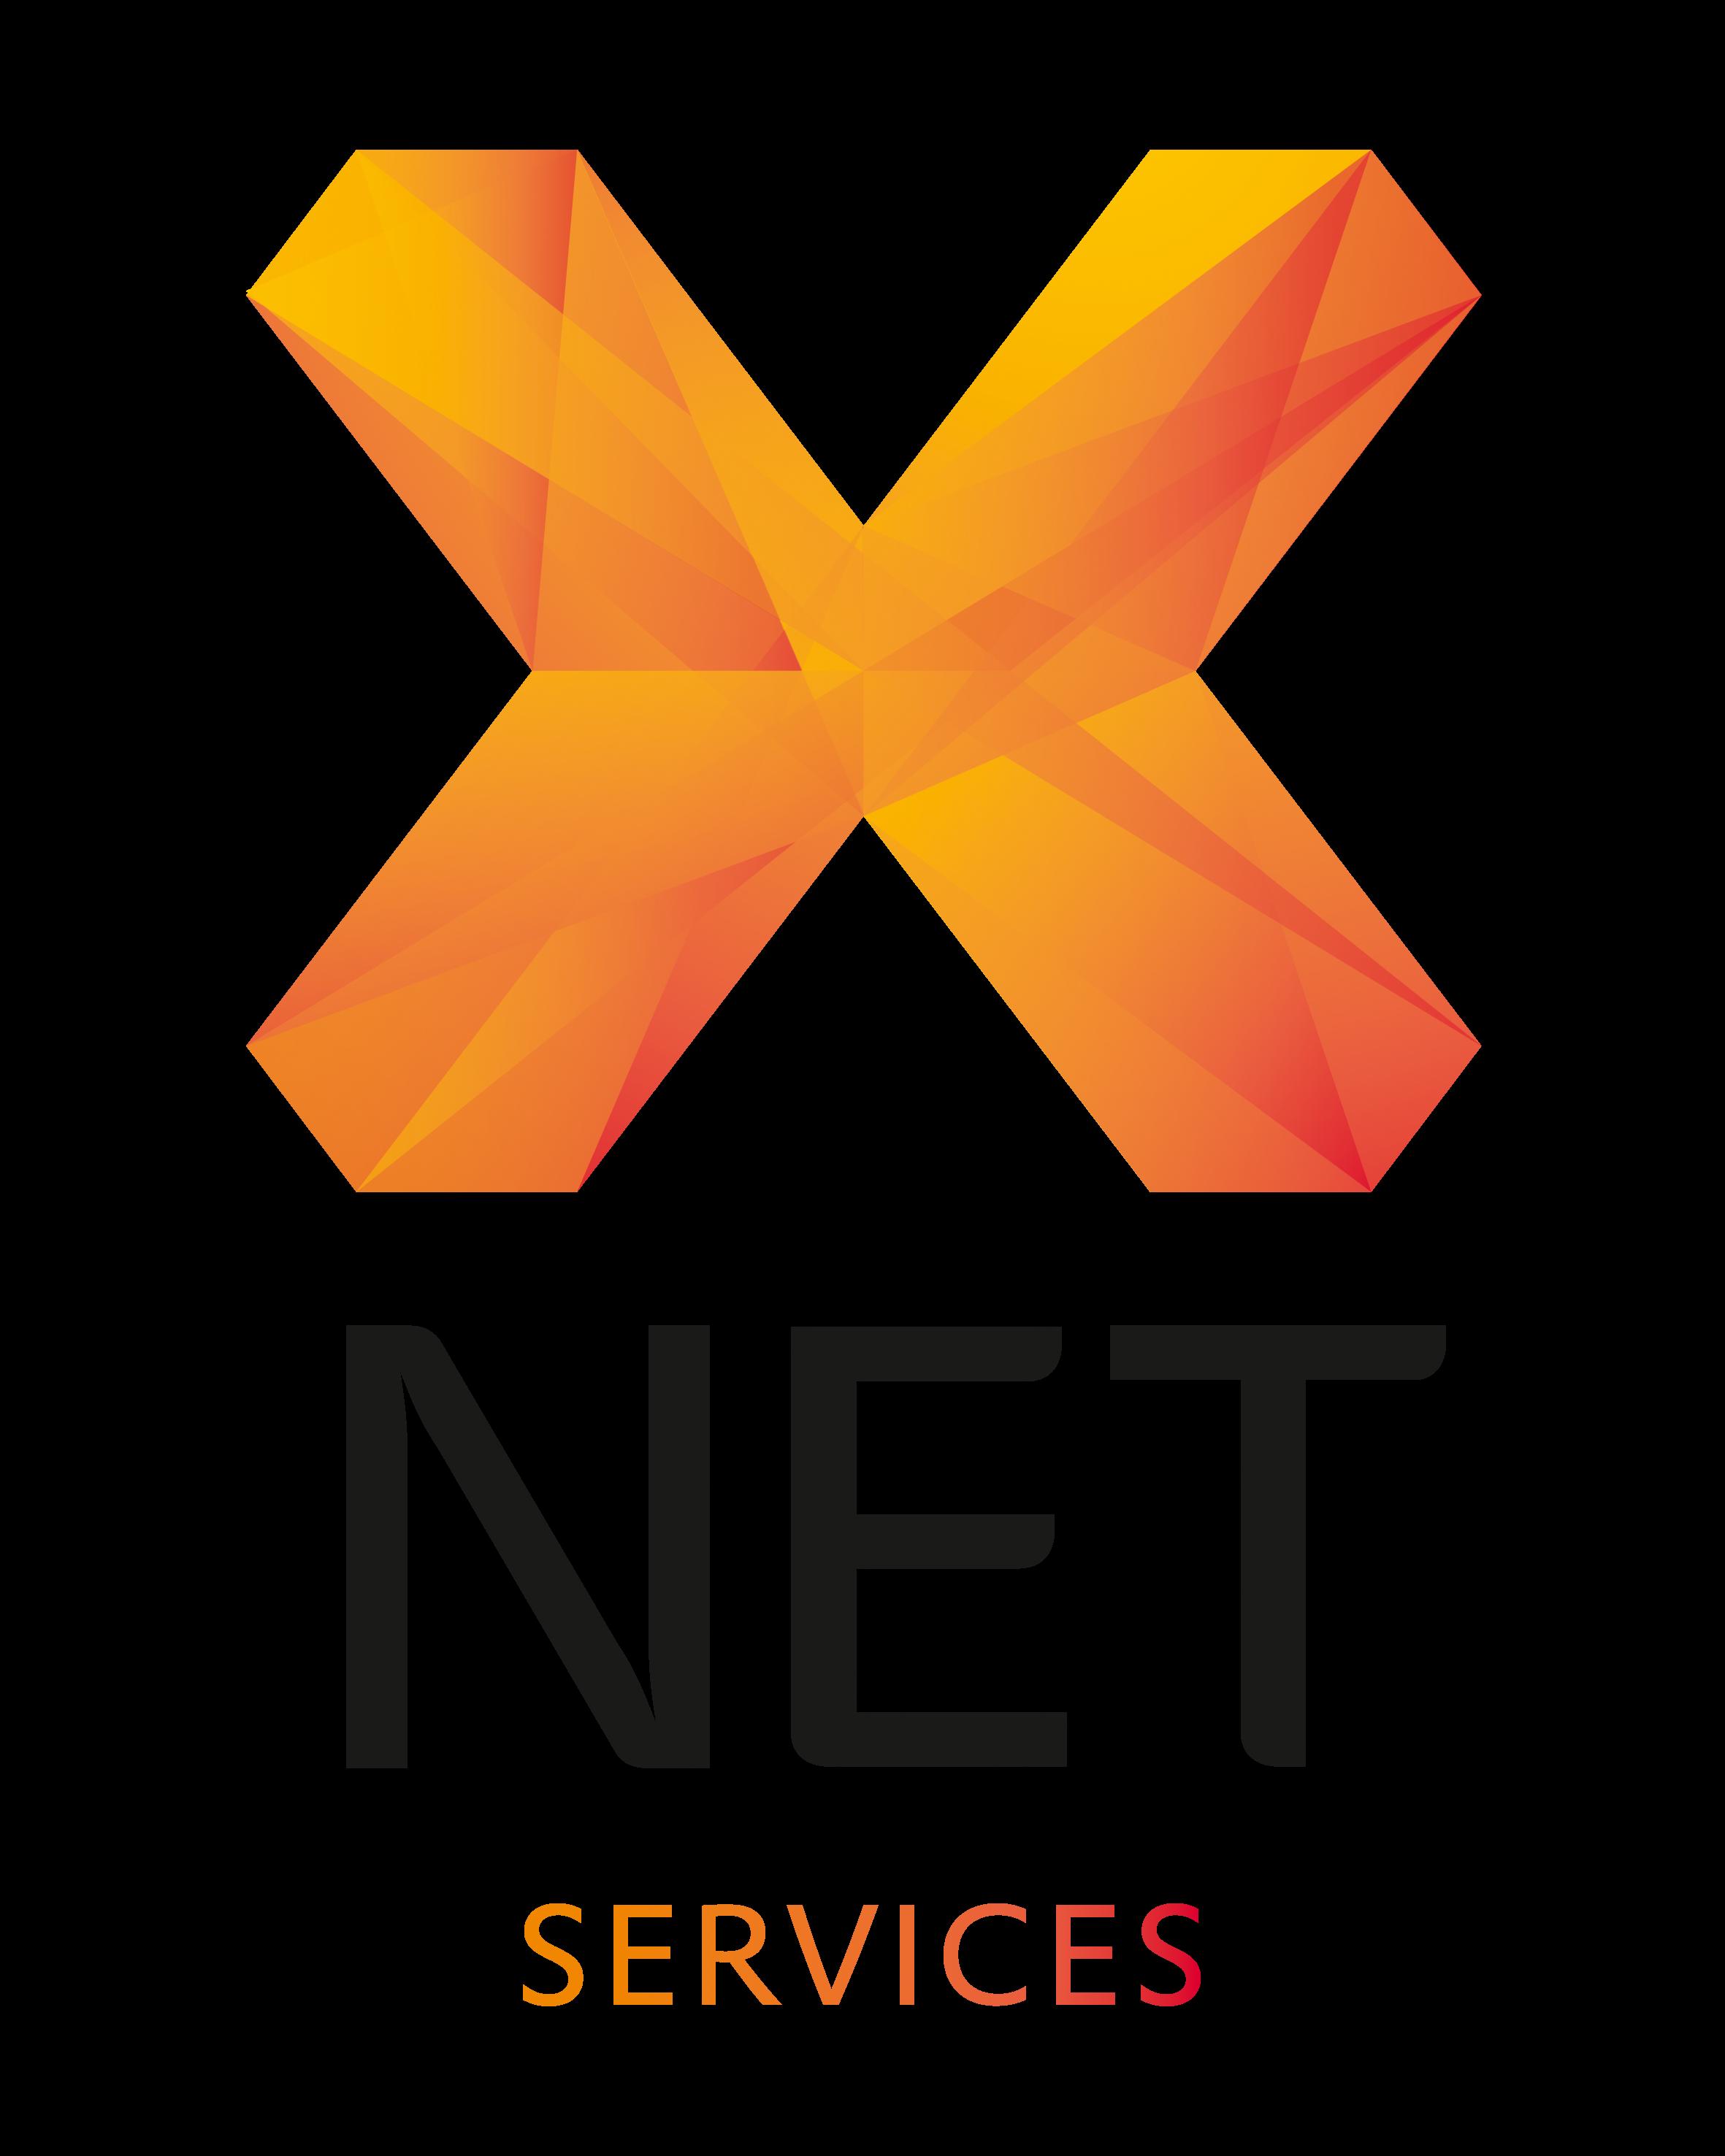 X-Net Services GmbH